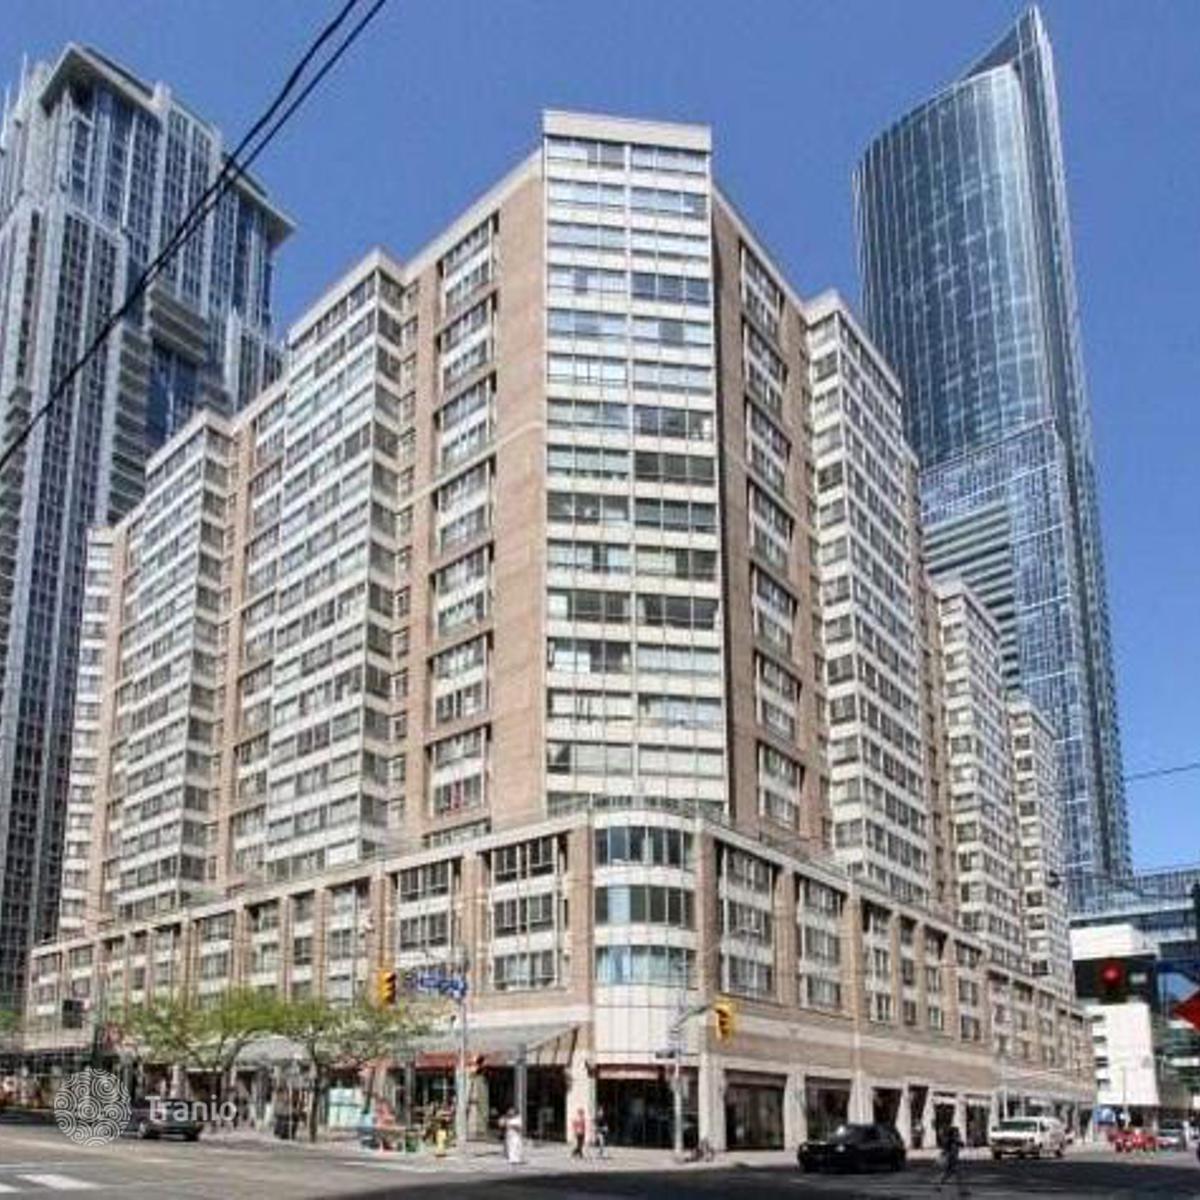 Canadian Apartments: Listing #1437433 In Toronto, Ontario, Canada